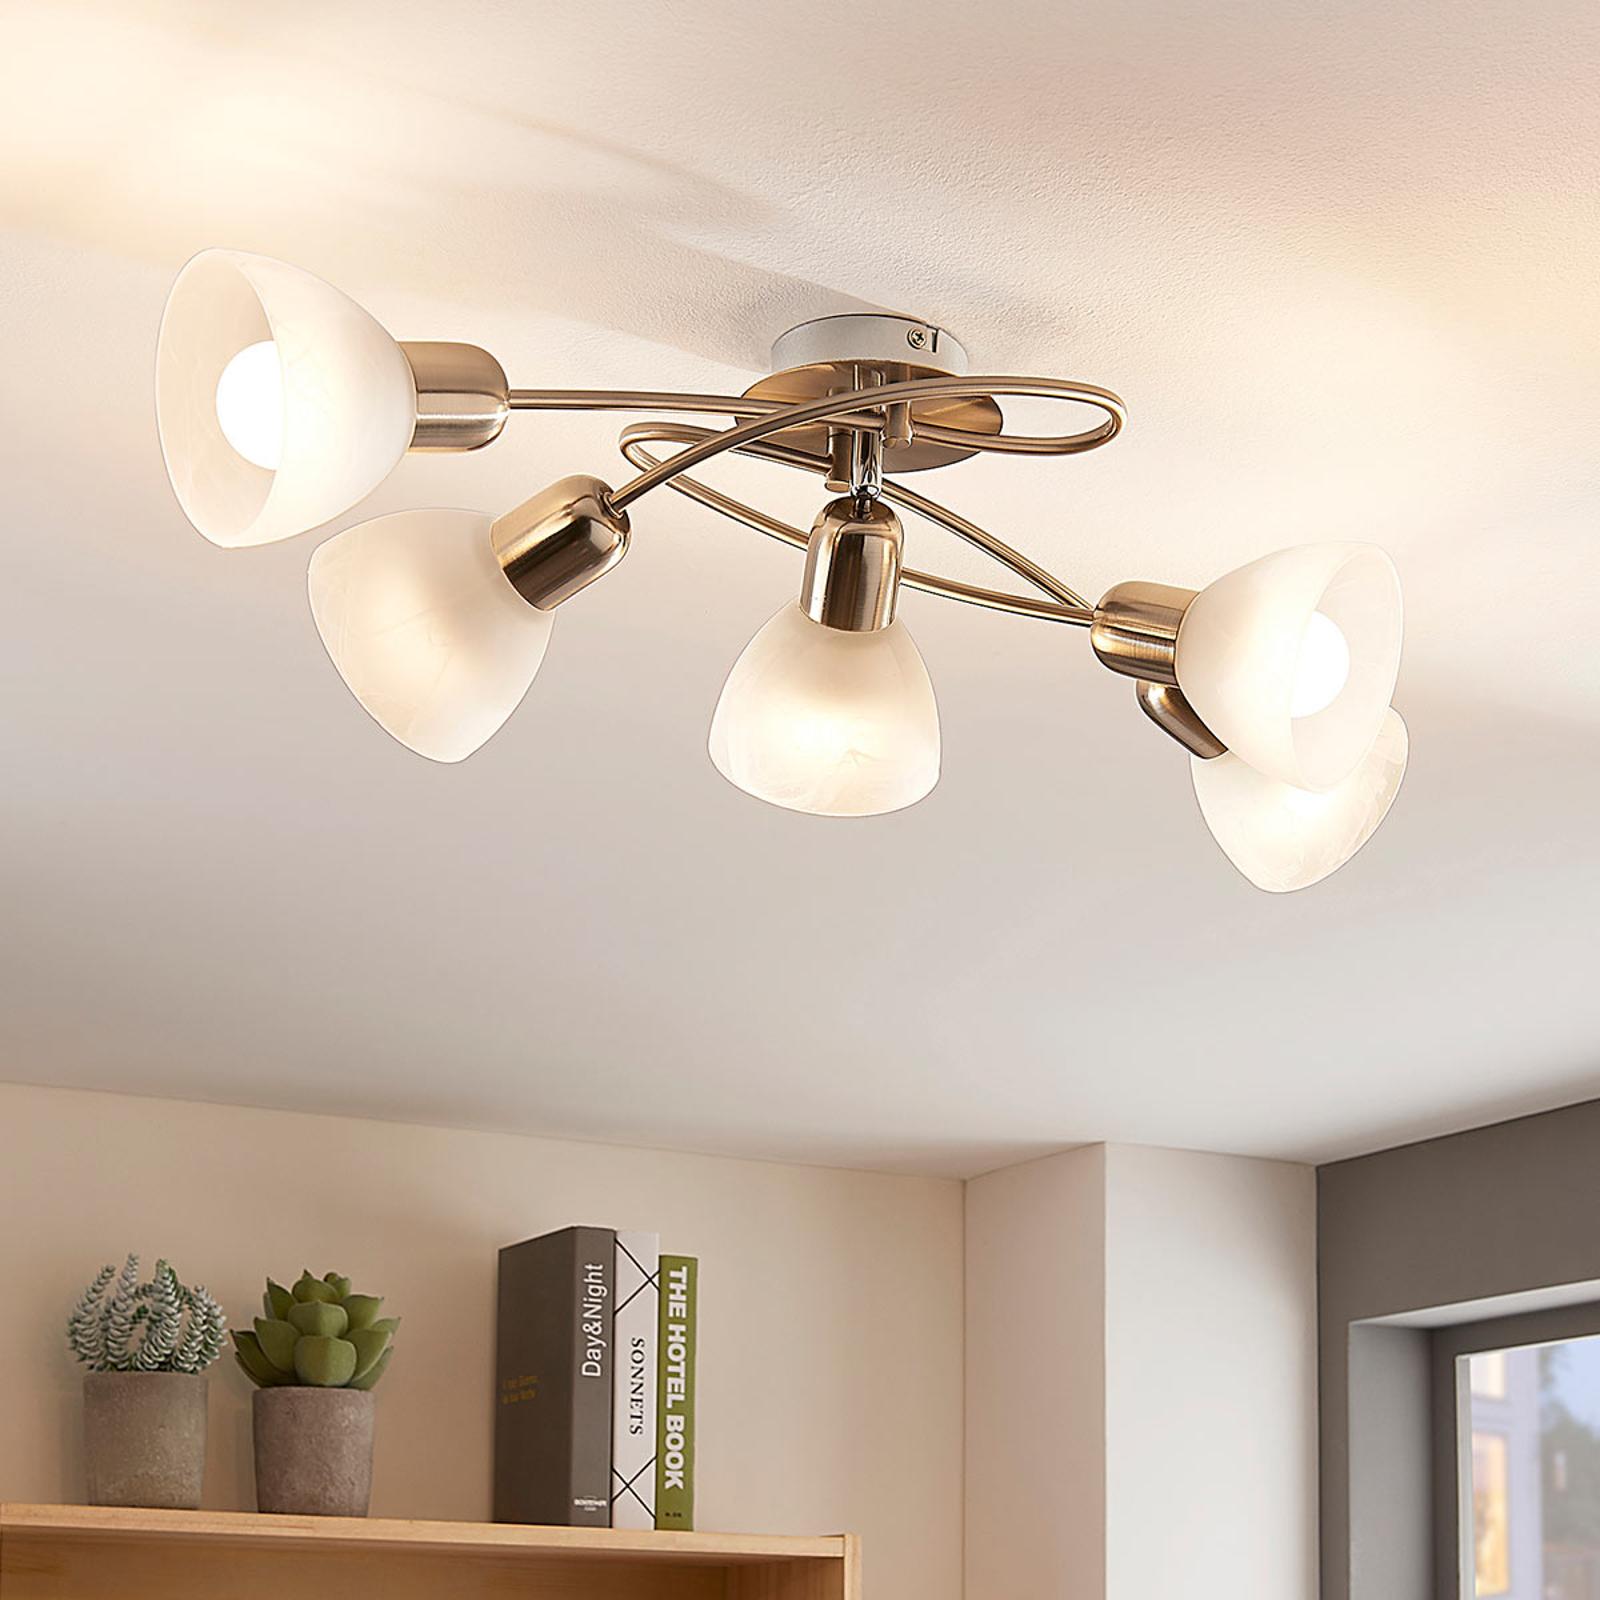 LED-taklampe Paulina med fem lys, stue